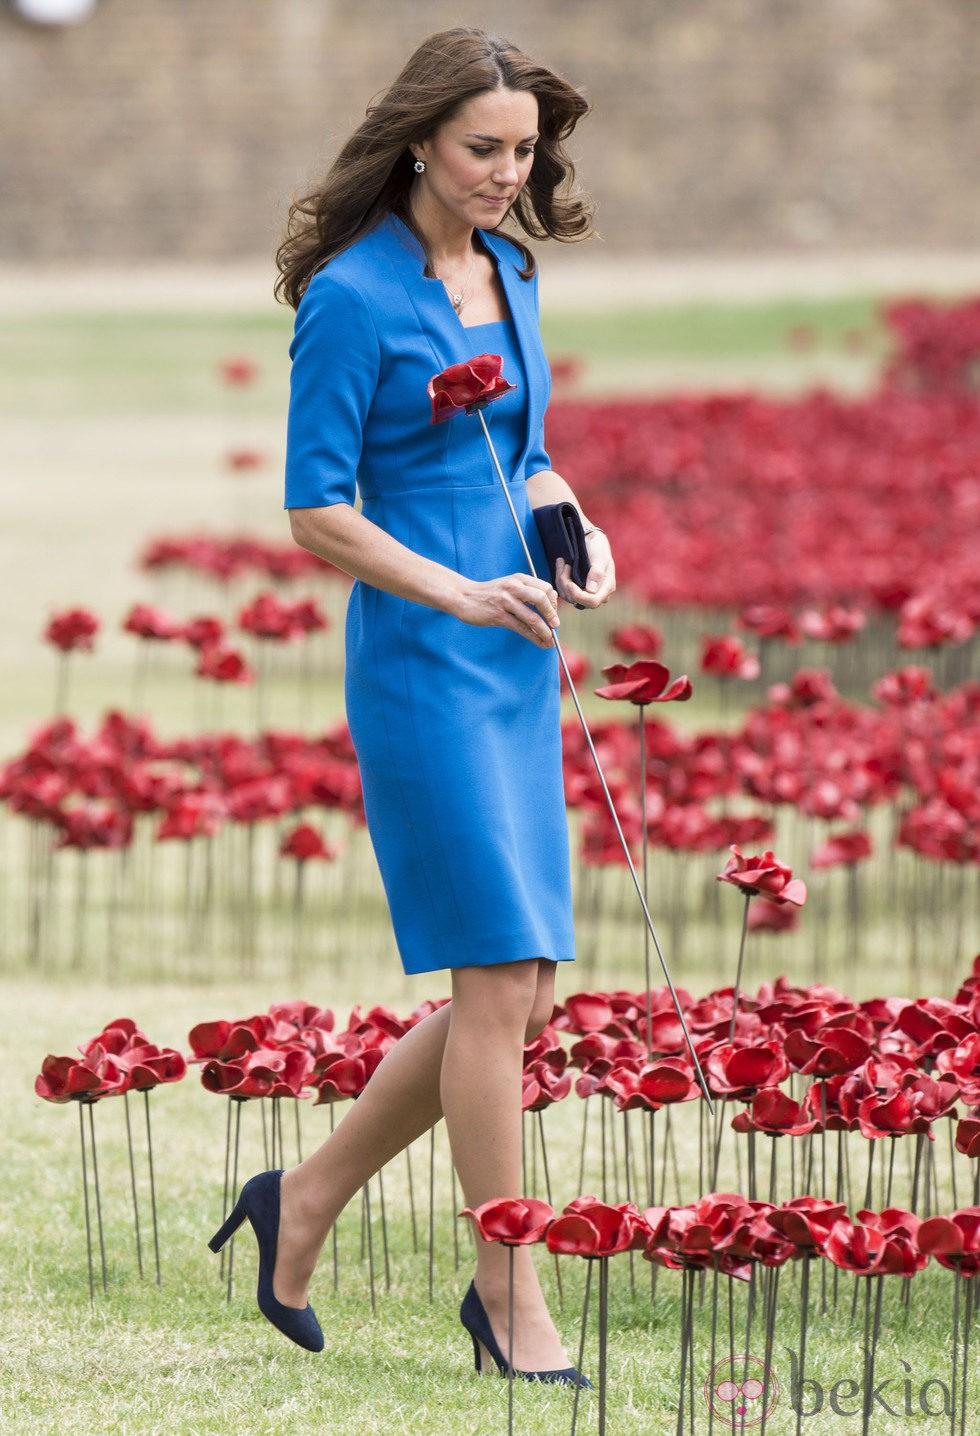 La Duquesa de Cambridge en la Torre de Londres